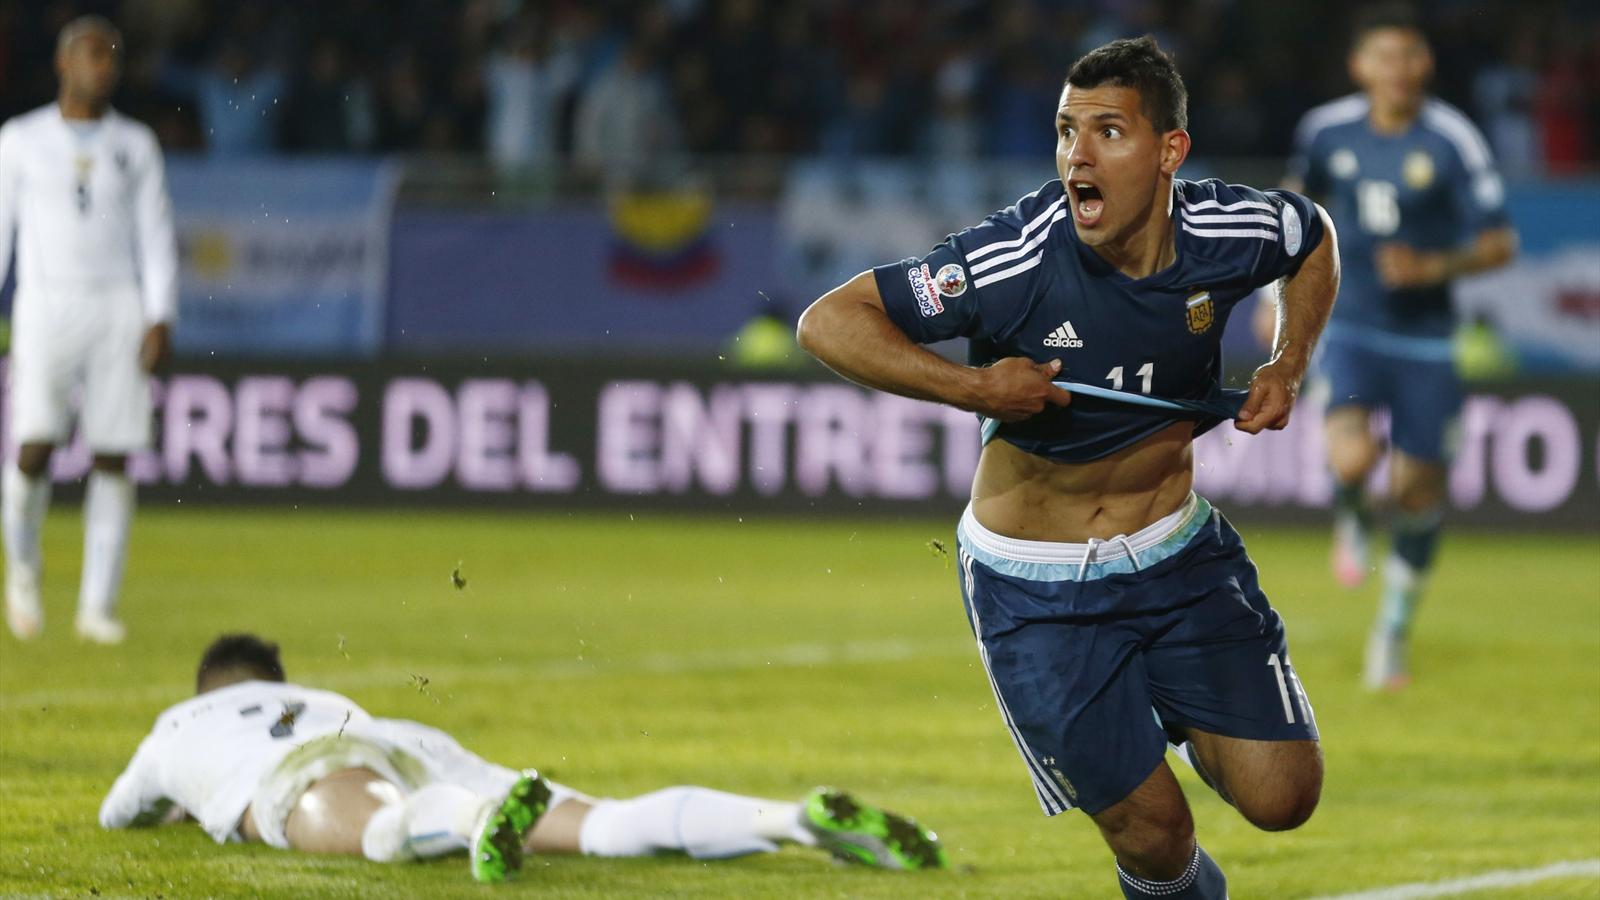 Argentina's Sergio Aguero celebrates a goal against Uruguay during their first round Copa America match at Estadio La Portada in La Serena, Chile